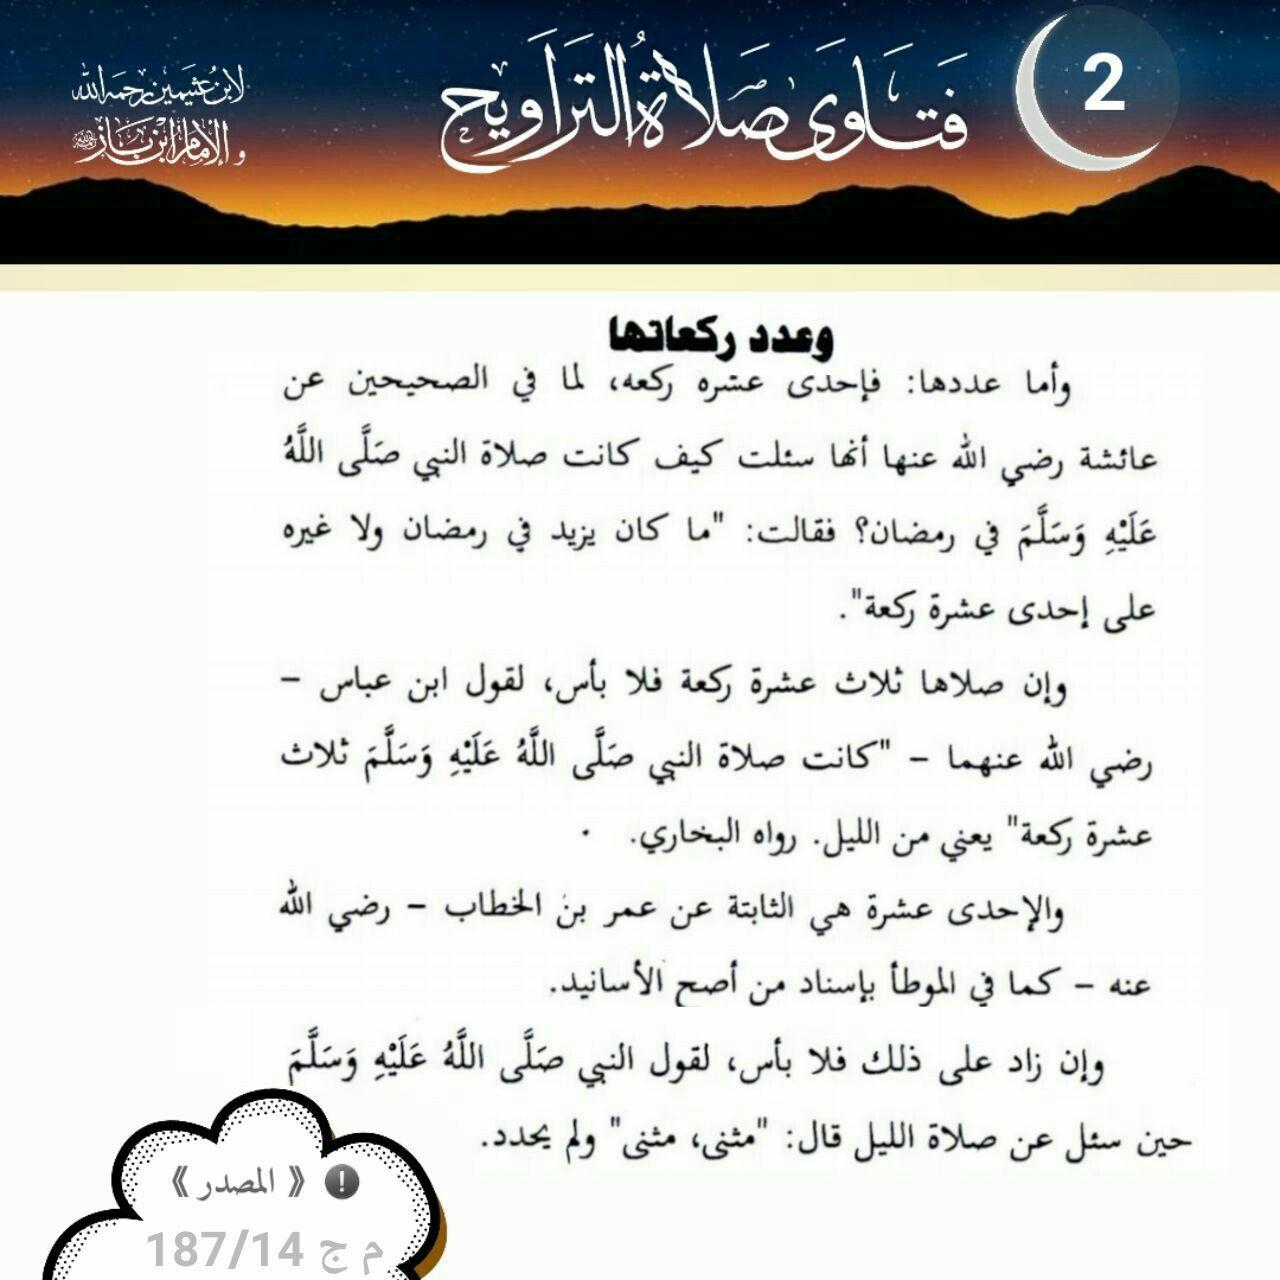 Pin By زهرة الياسمين On سلسلة فتاوى صلاة التراويح Calligraphy Arabic Calligraphy